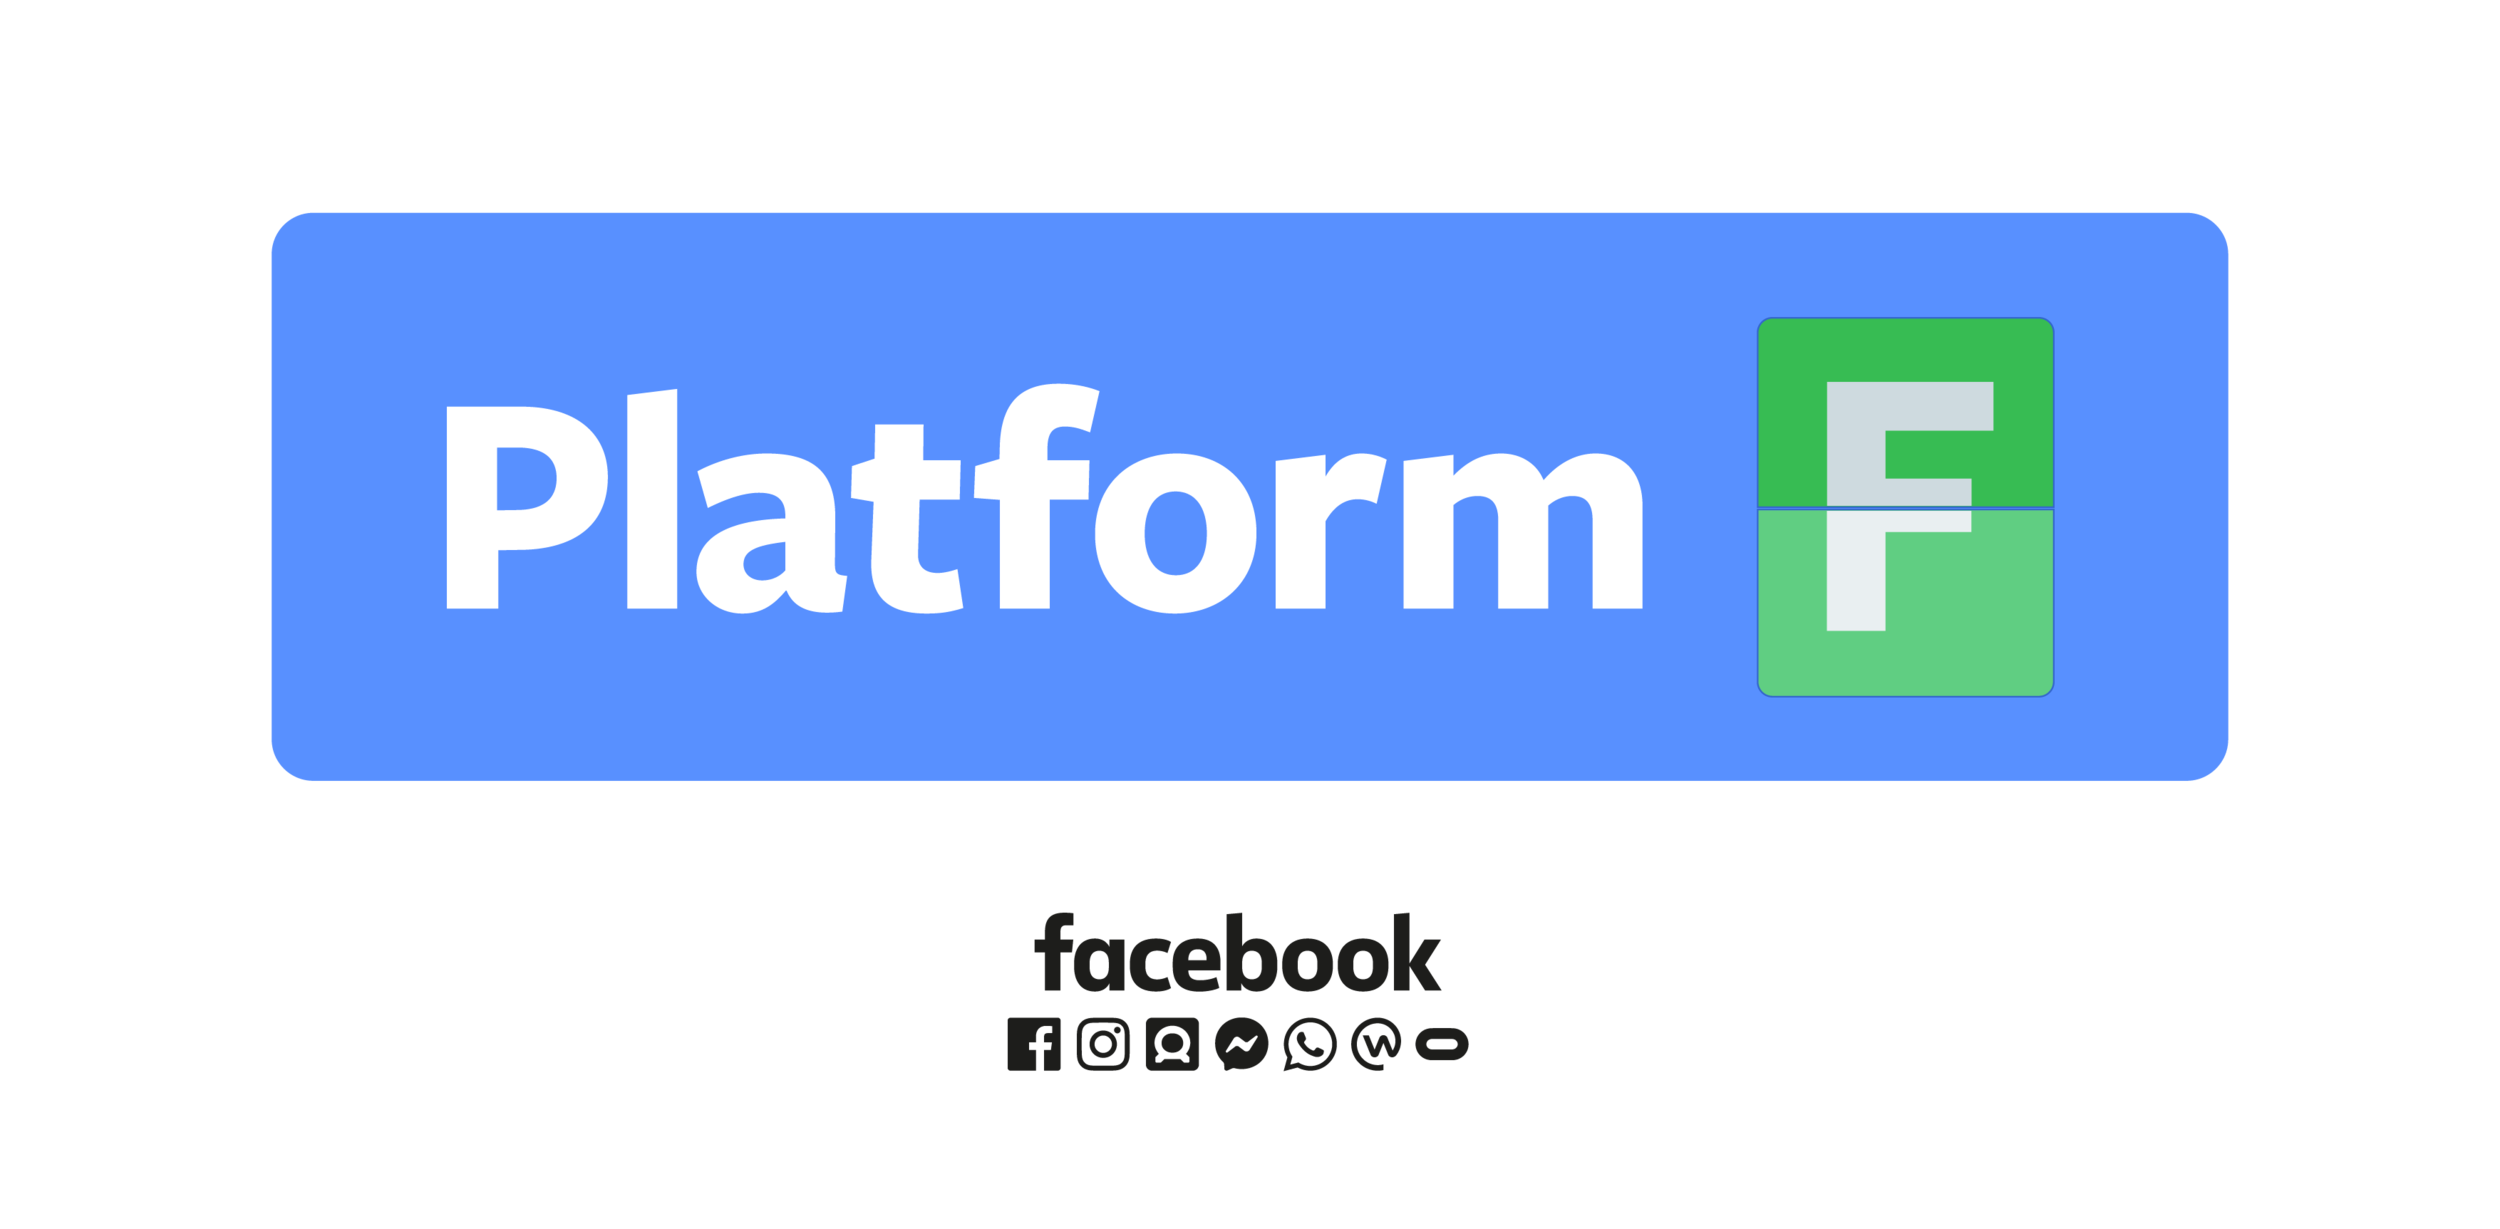 Platform f event